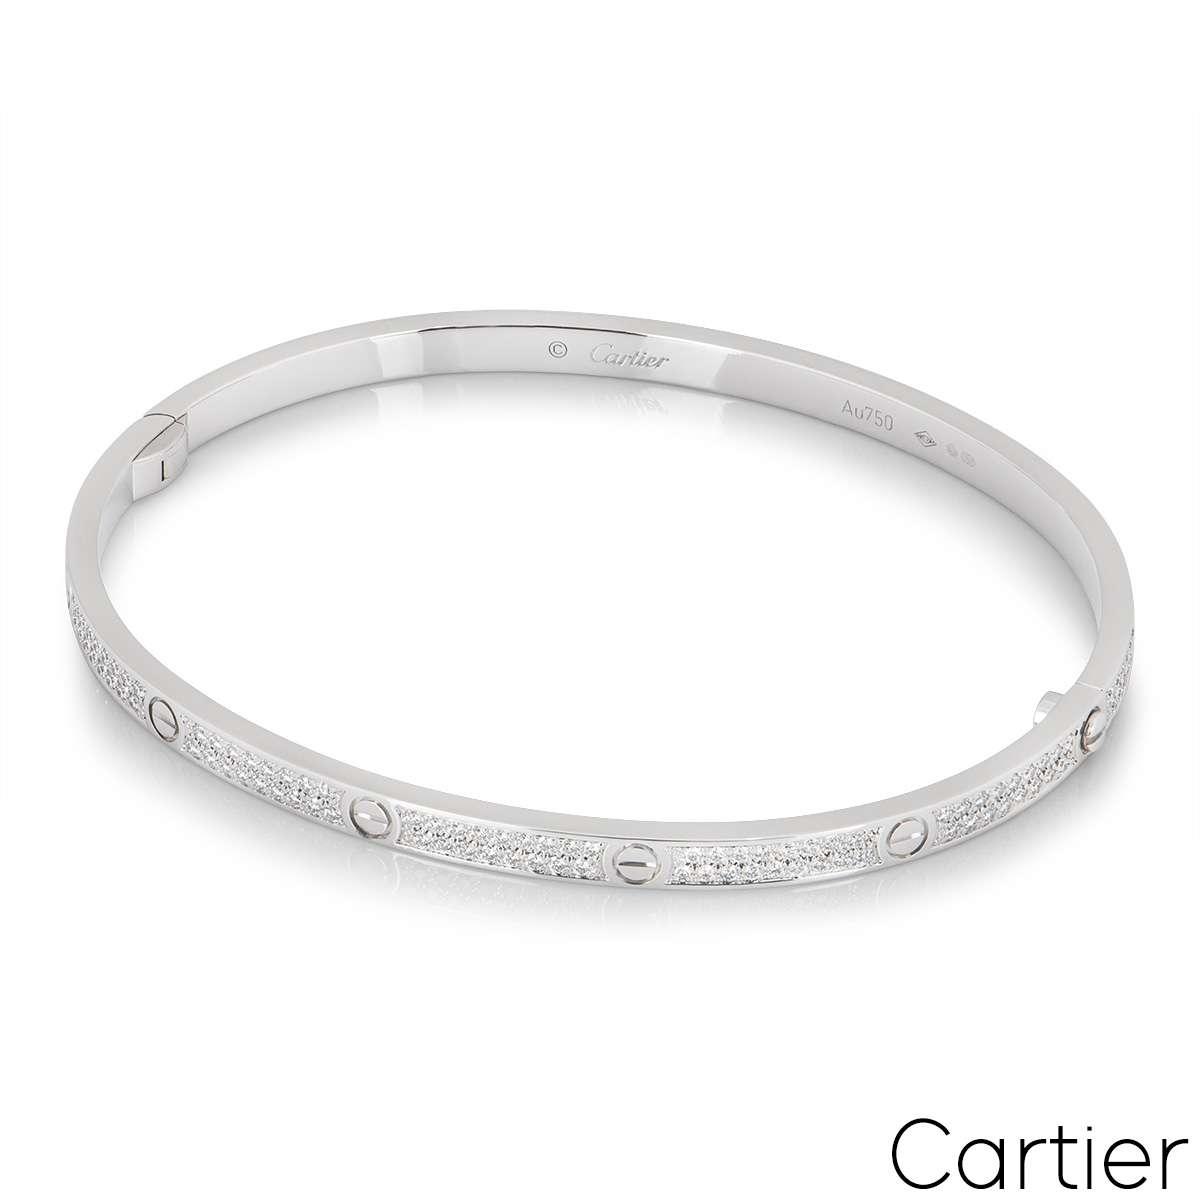 Cartier White Gold Pave Diamond SM Love Bracelet Size 16 N6710816